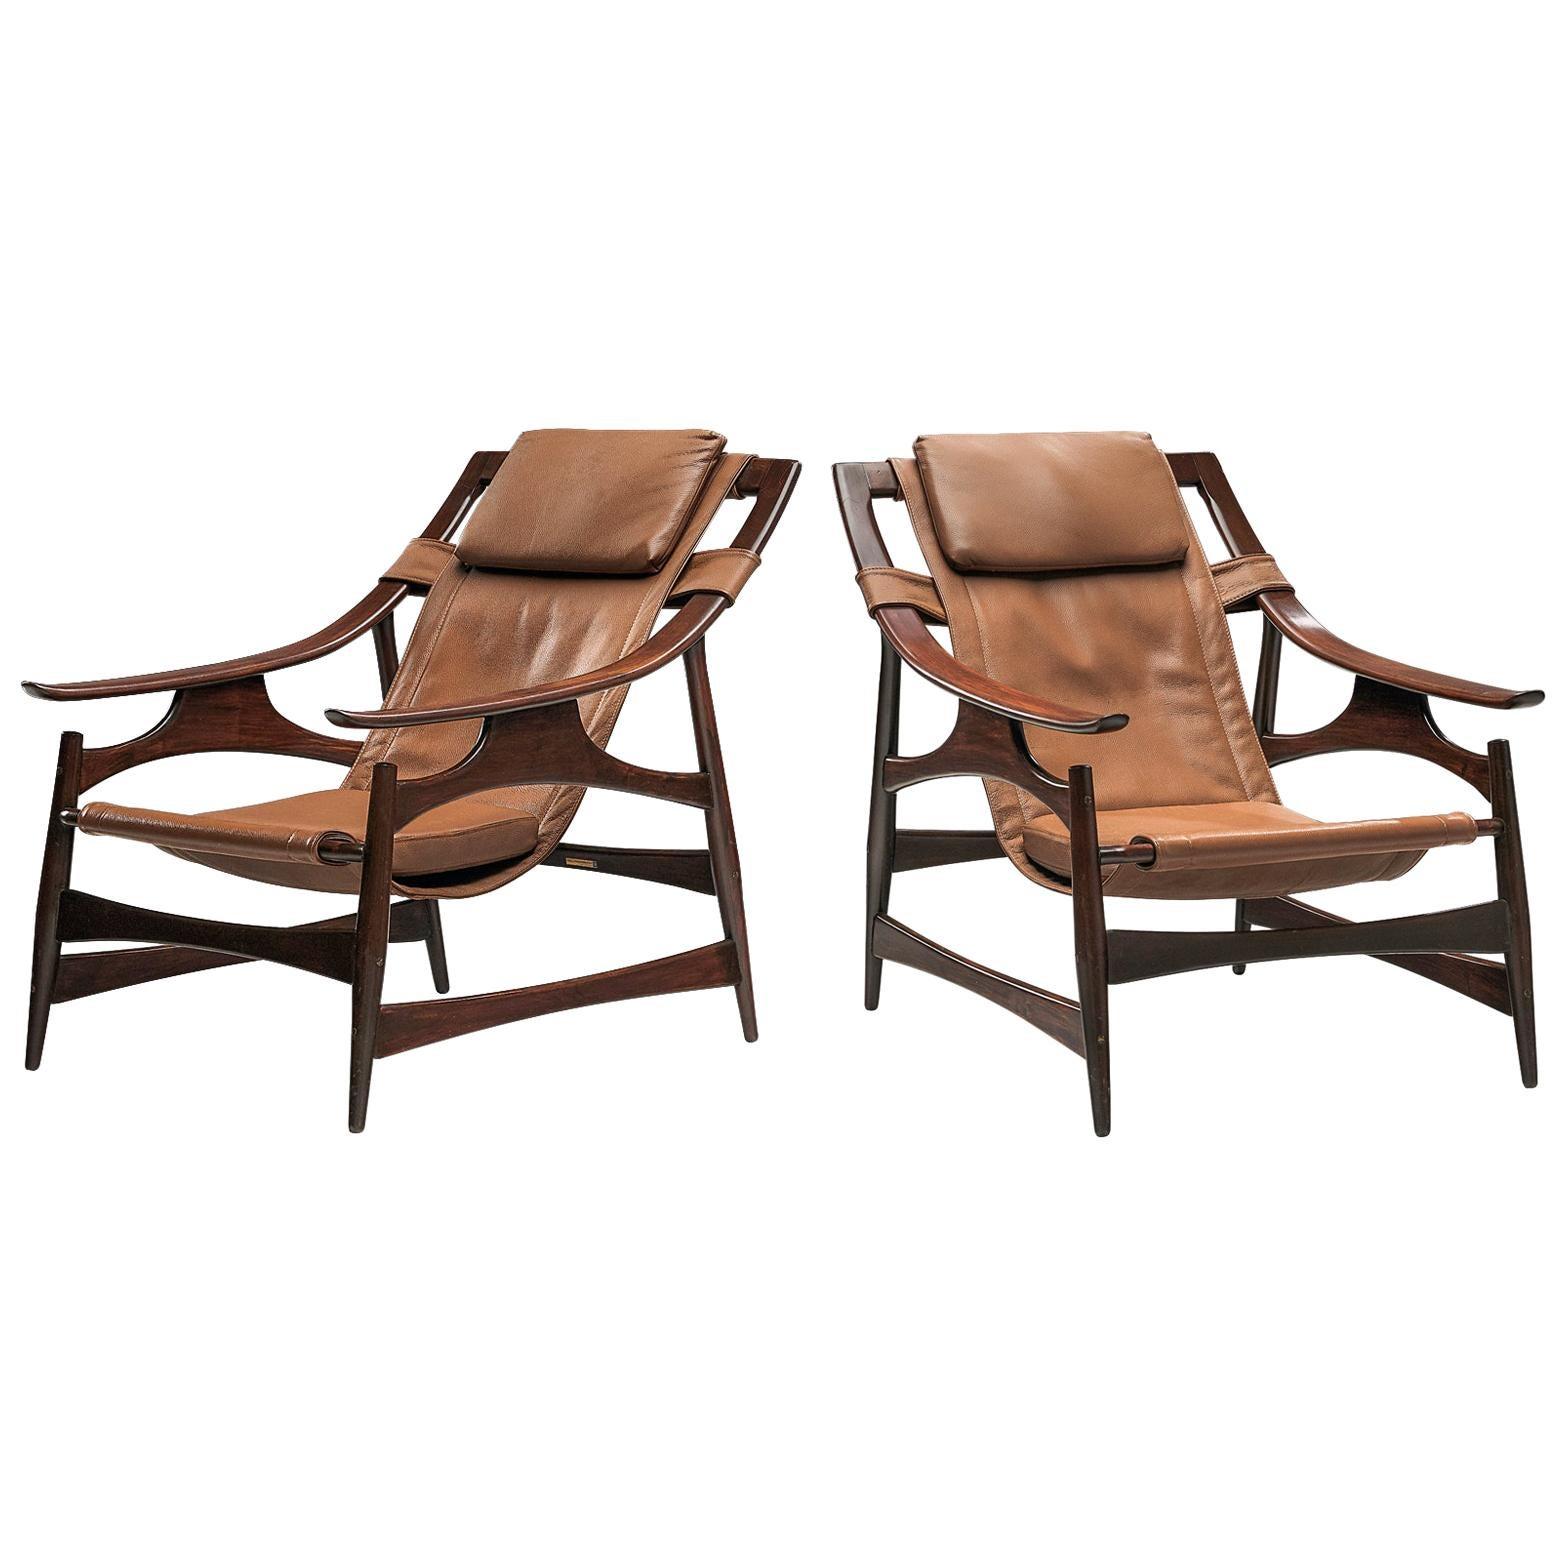 Lounge Chair in Brazillian Walnut by Liceu De Artes Sao Paulo